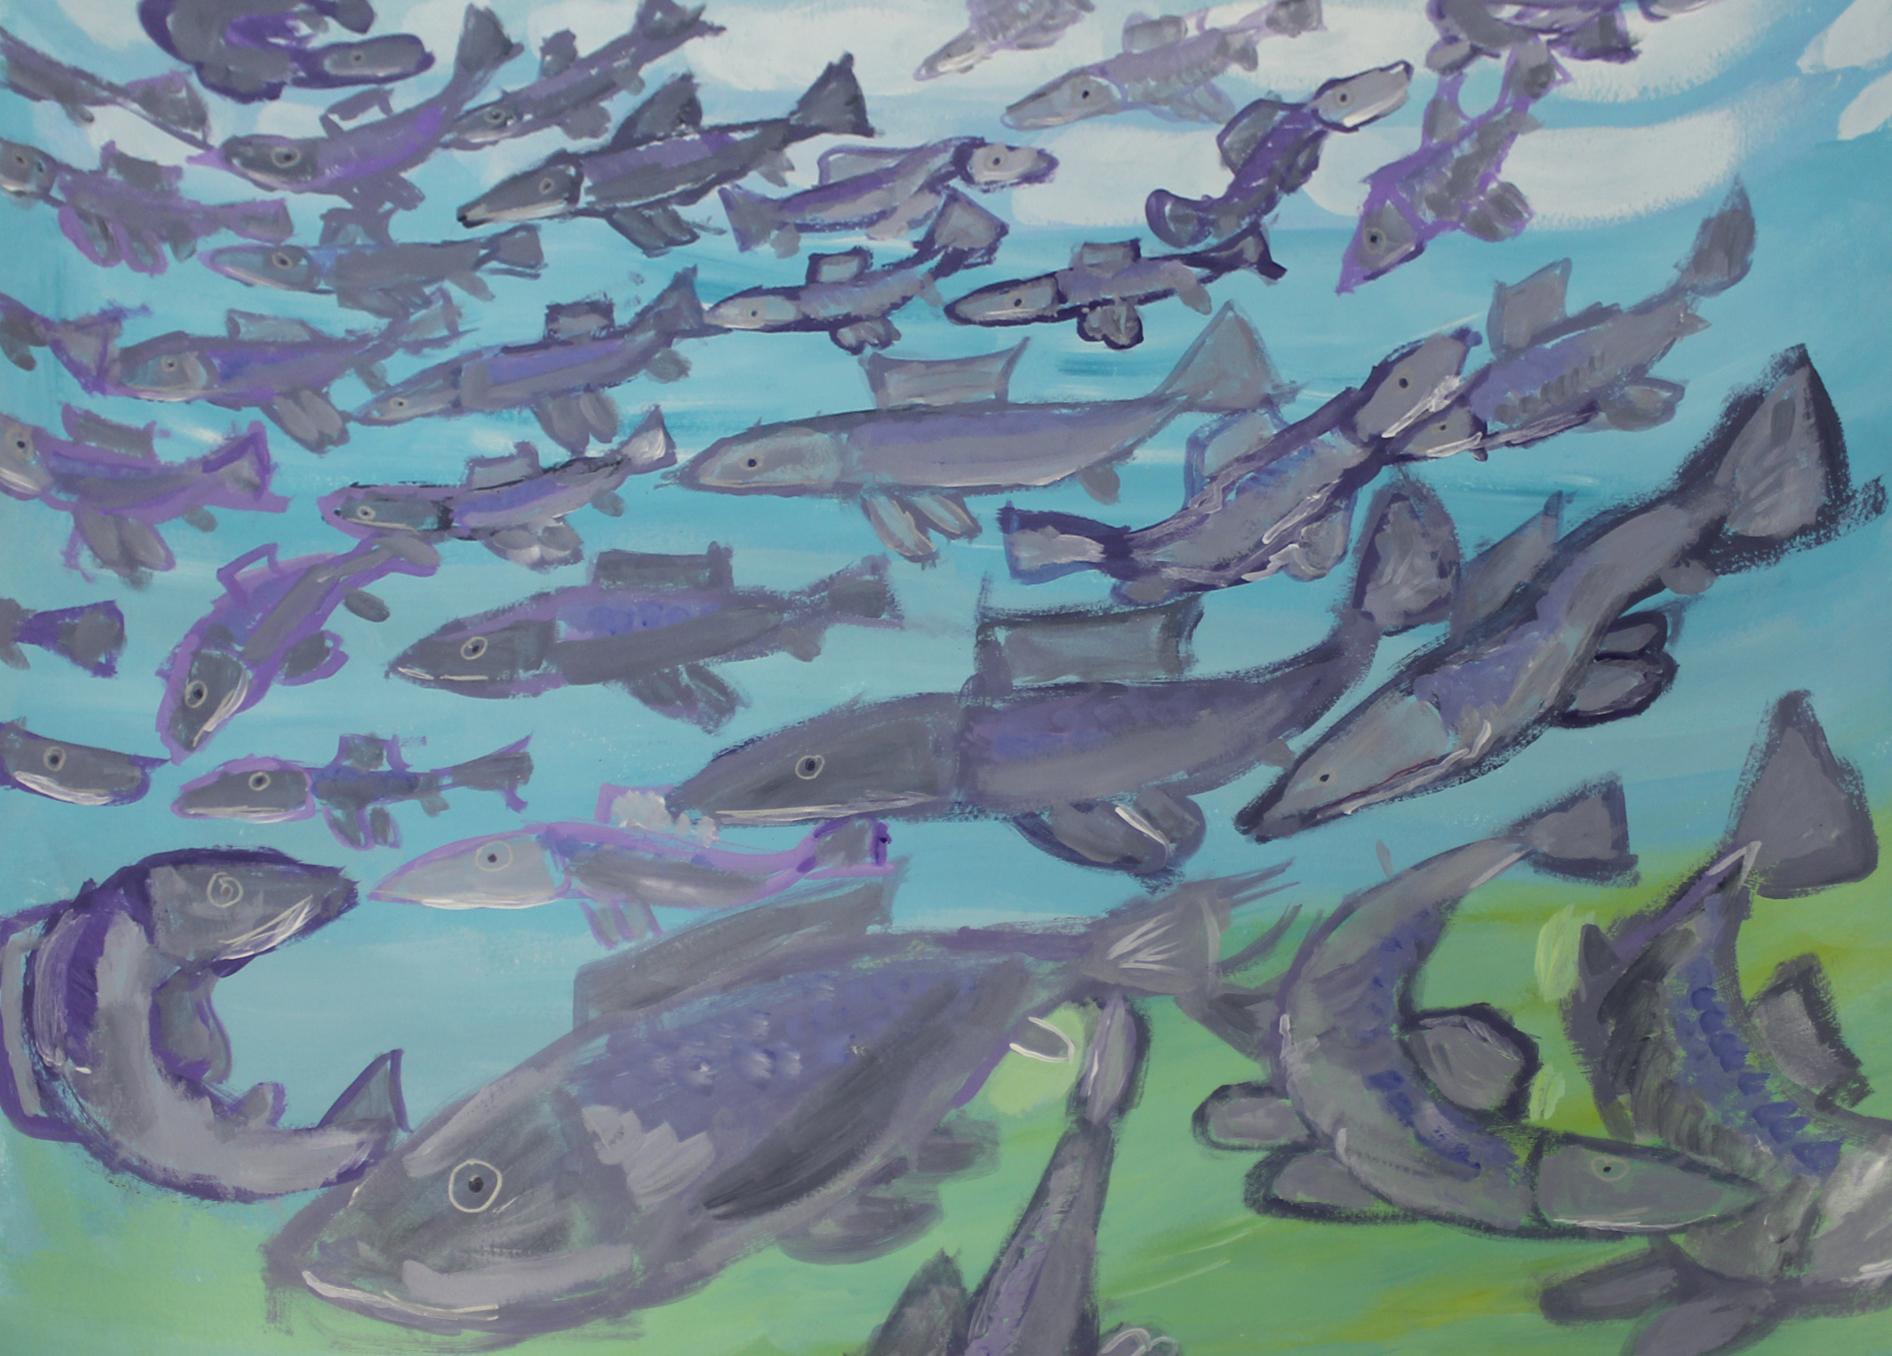 Artwork of the Week – 'Under Water Silver Sock Eye Salmon' by Josephina Mena